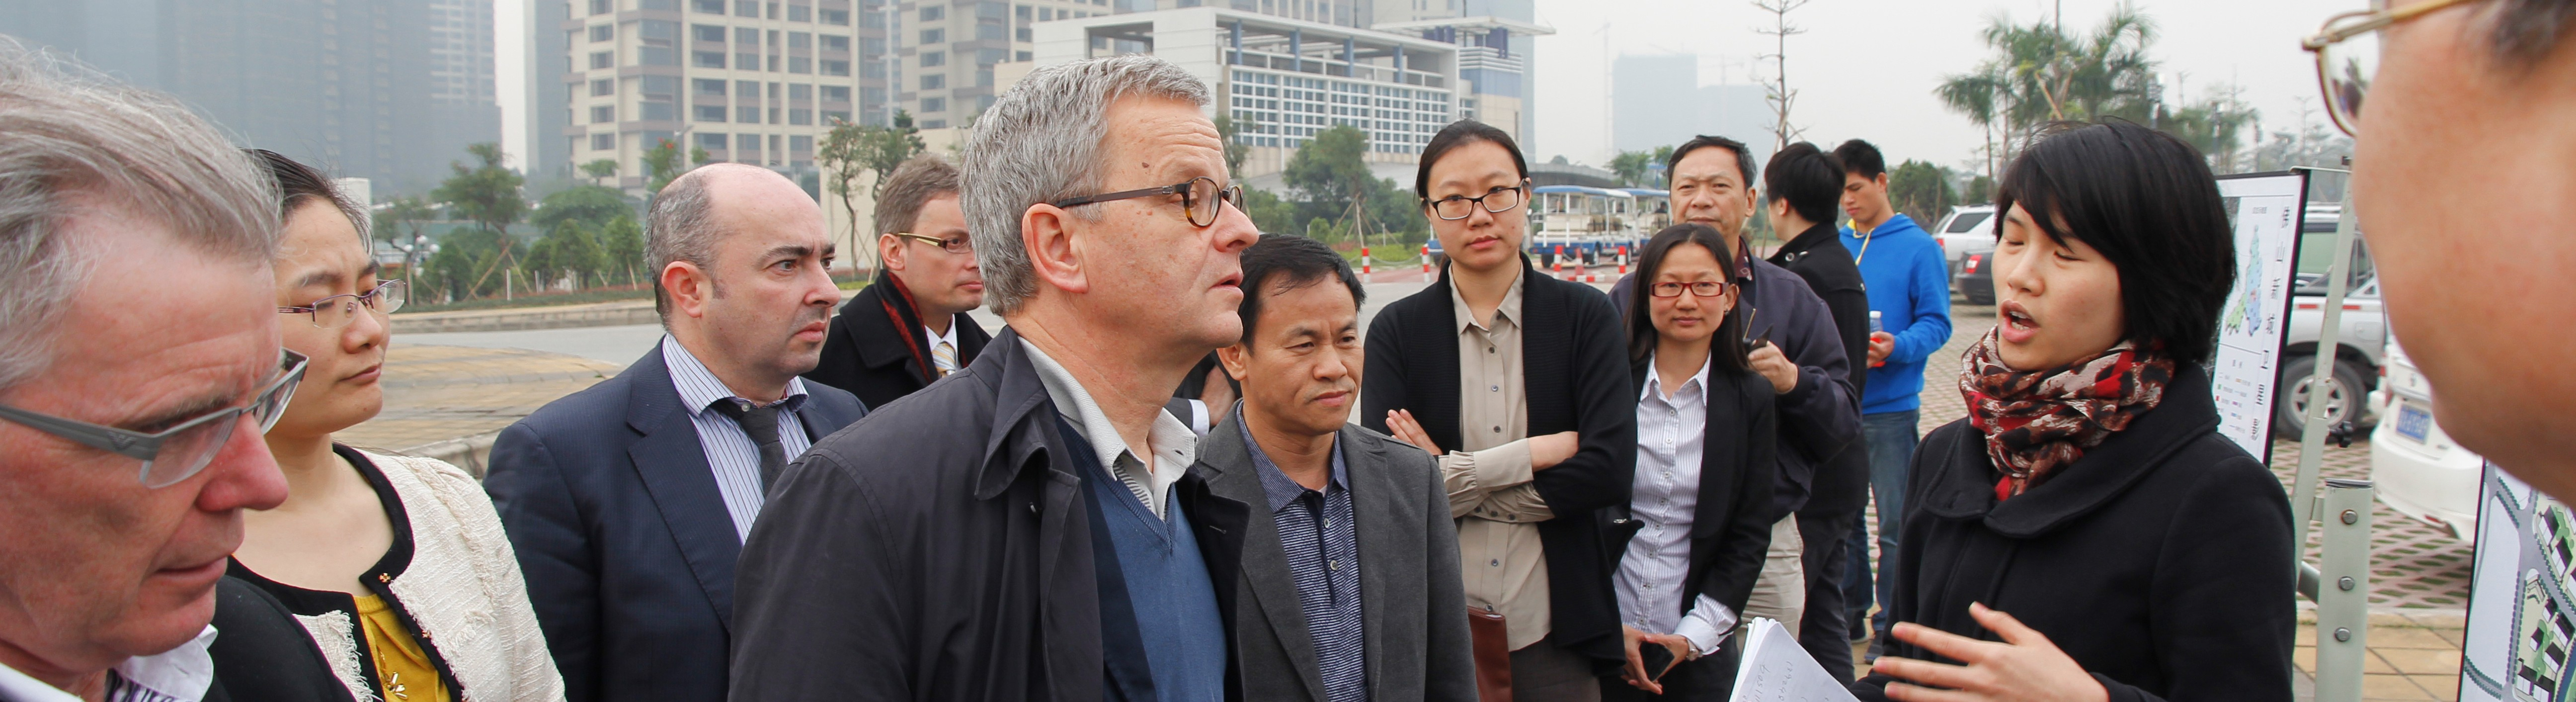 2012 DG REGIO Guangzhou